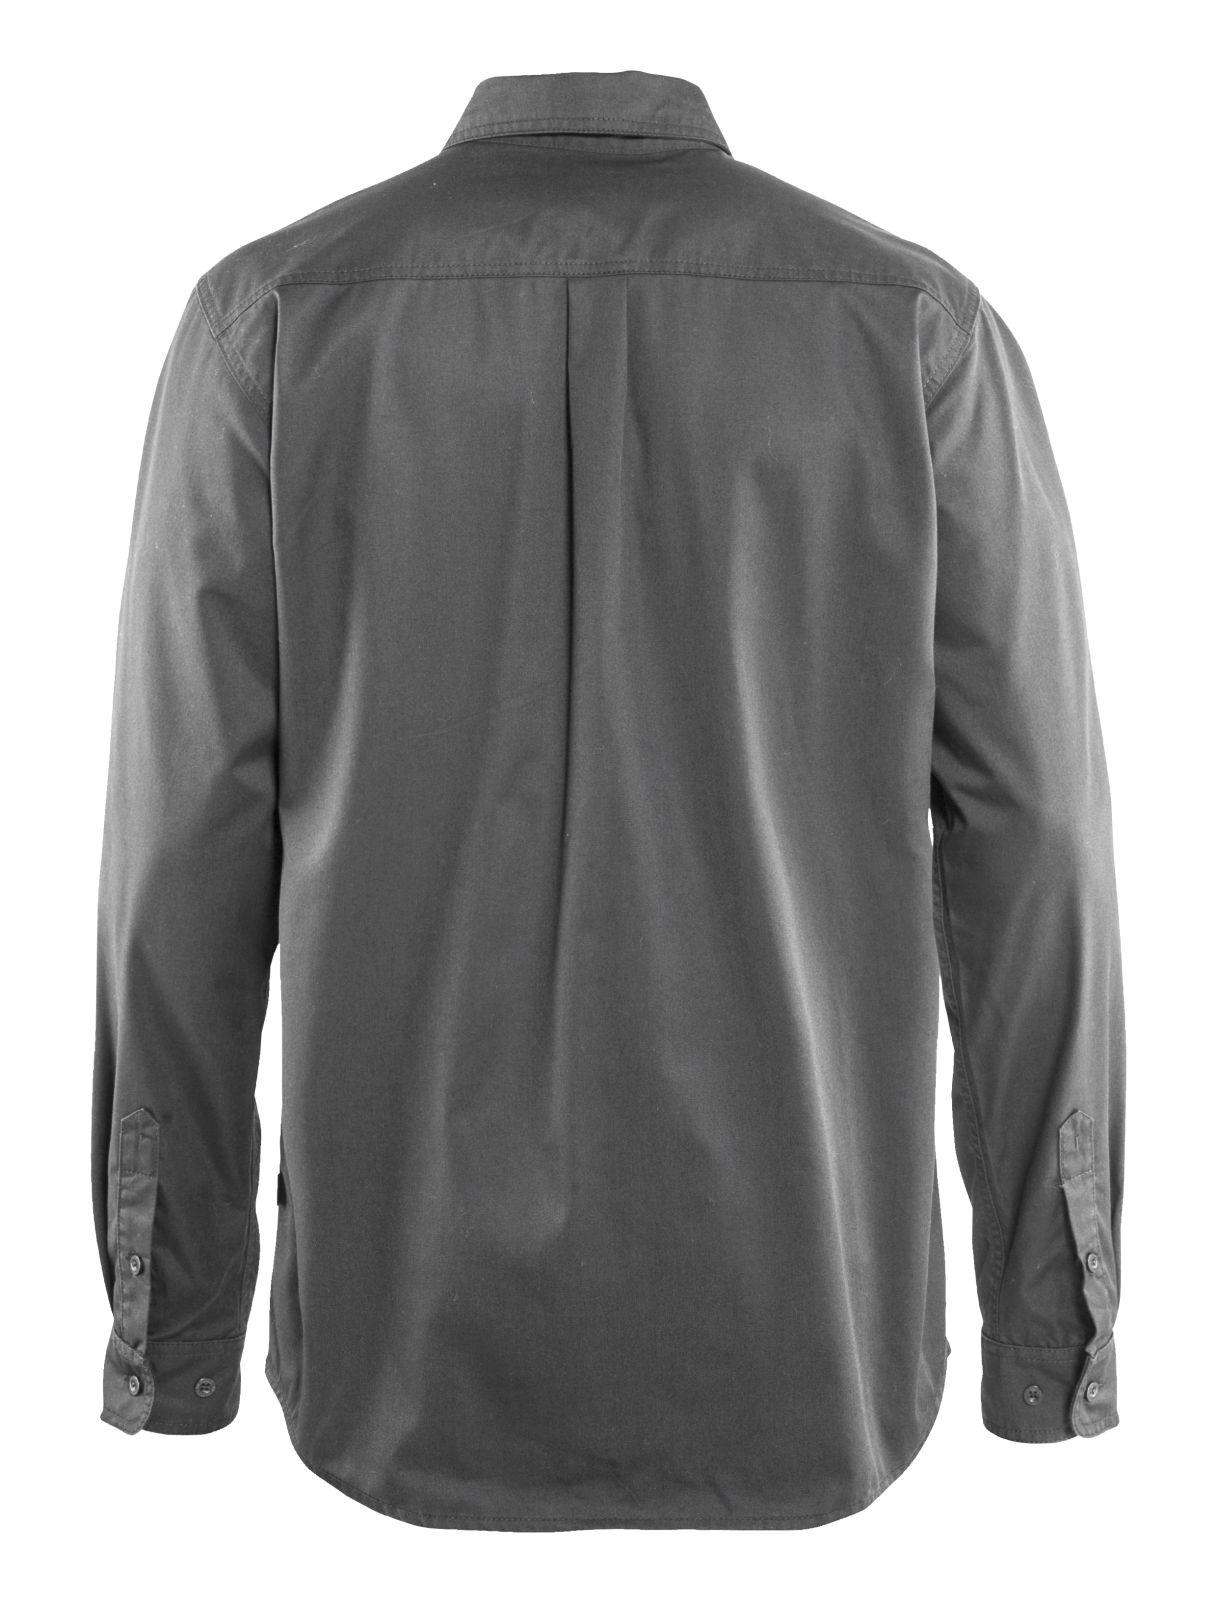 Blaklader Overhemden 32981190 grijs(9400)